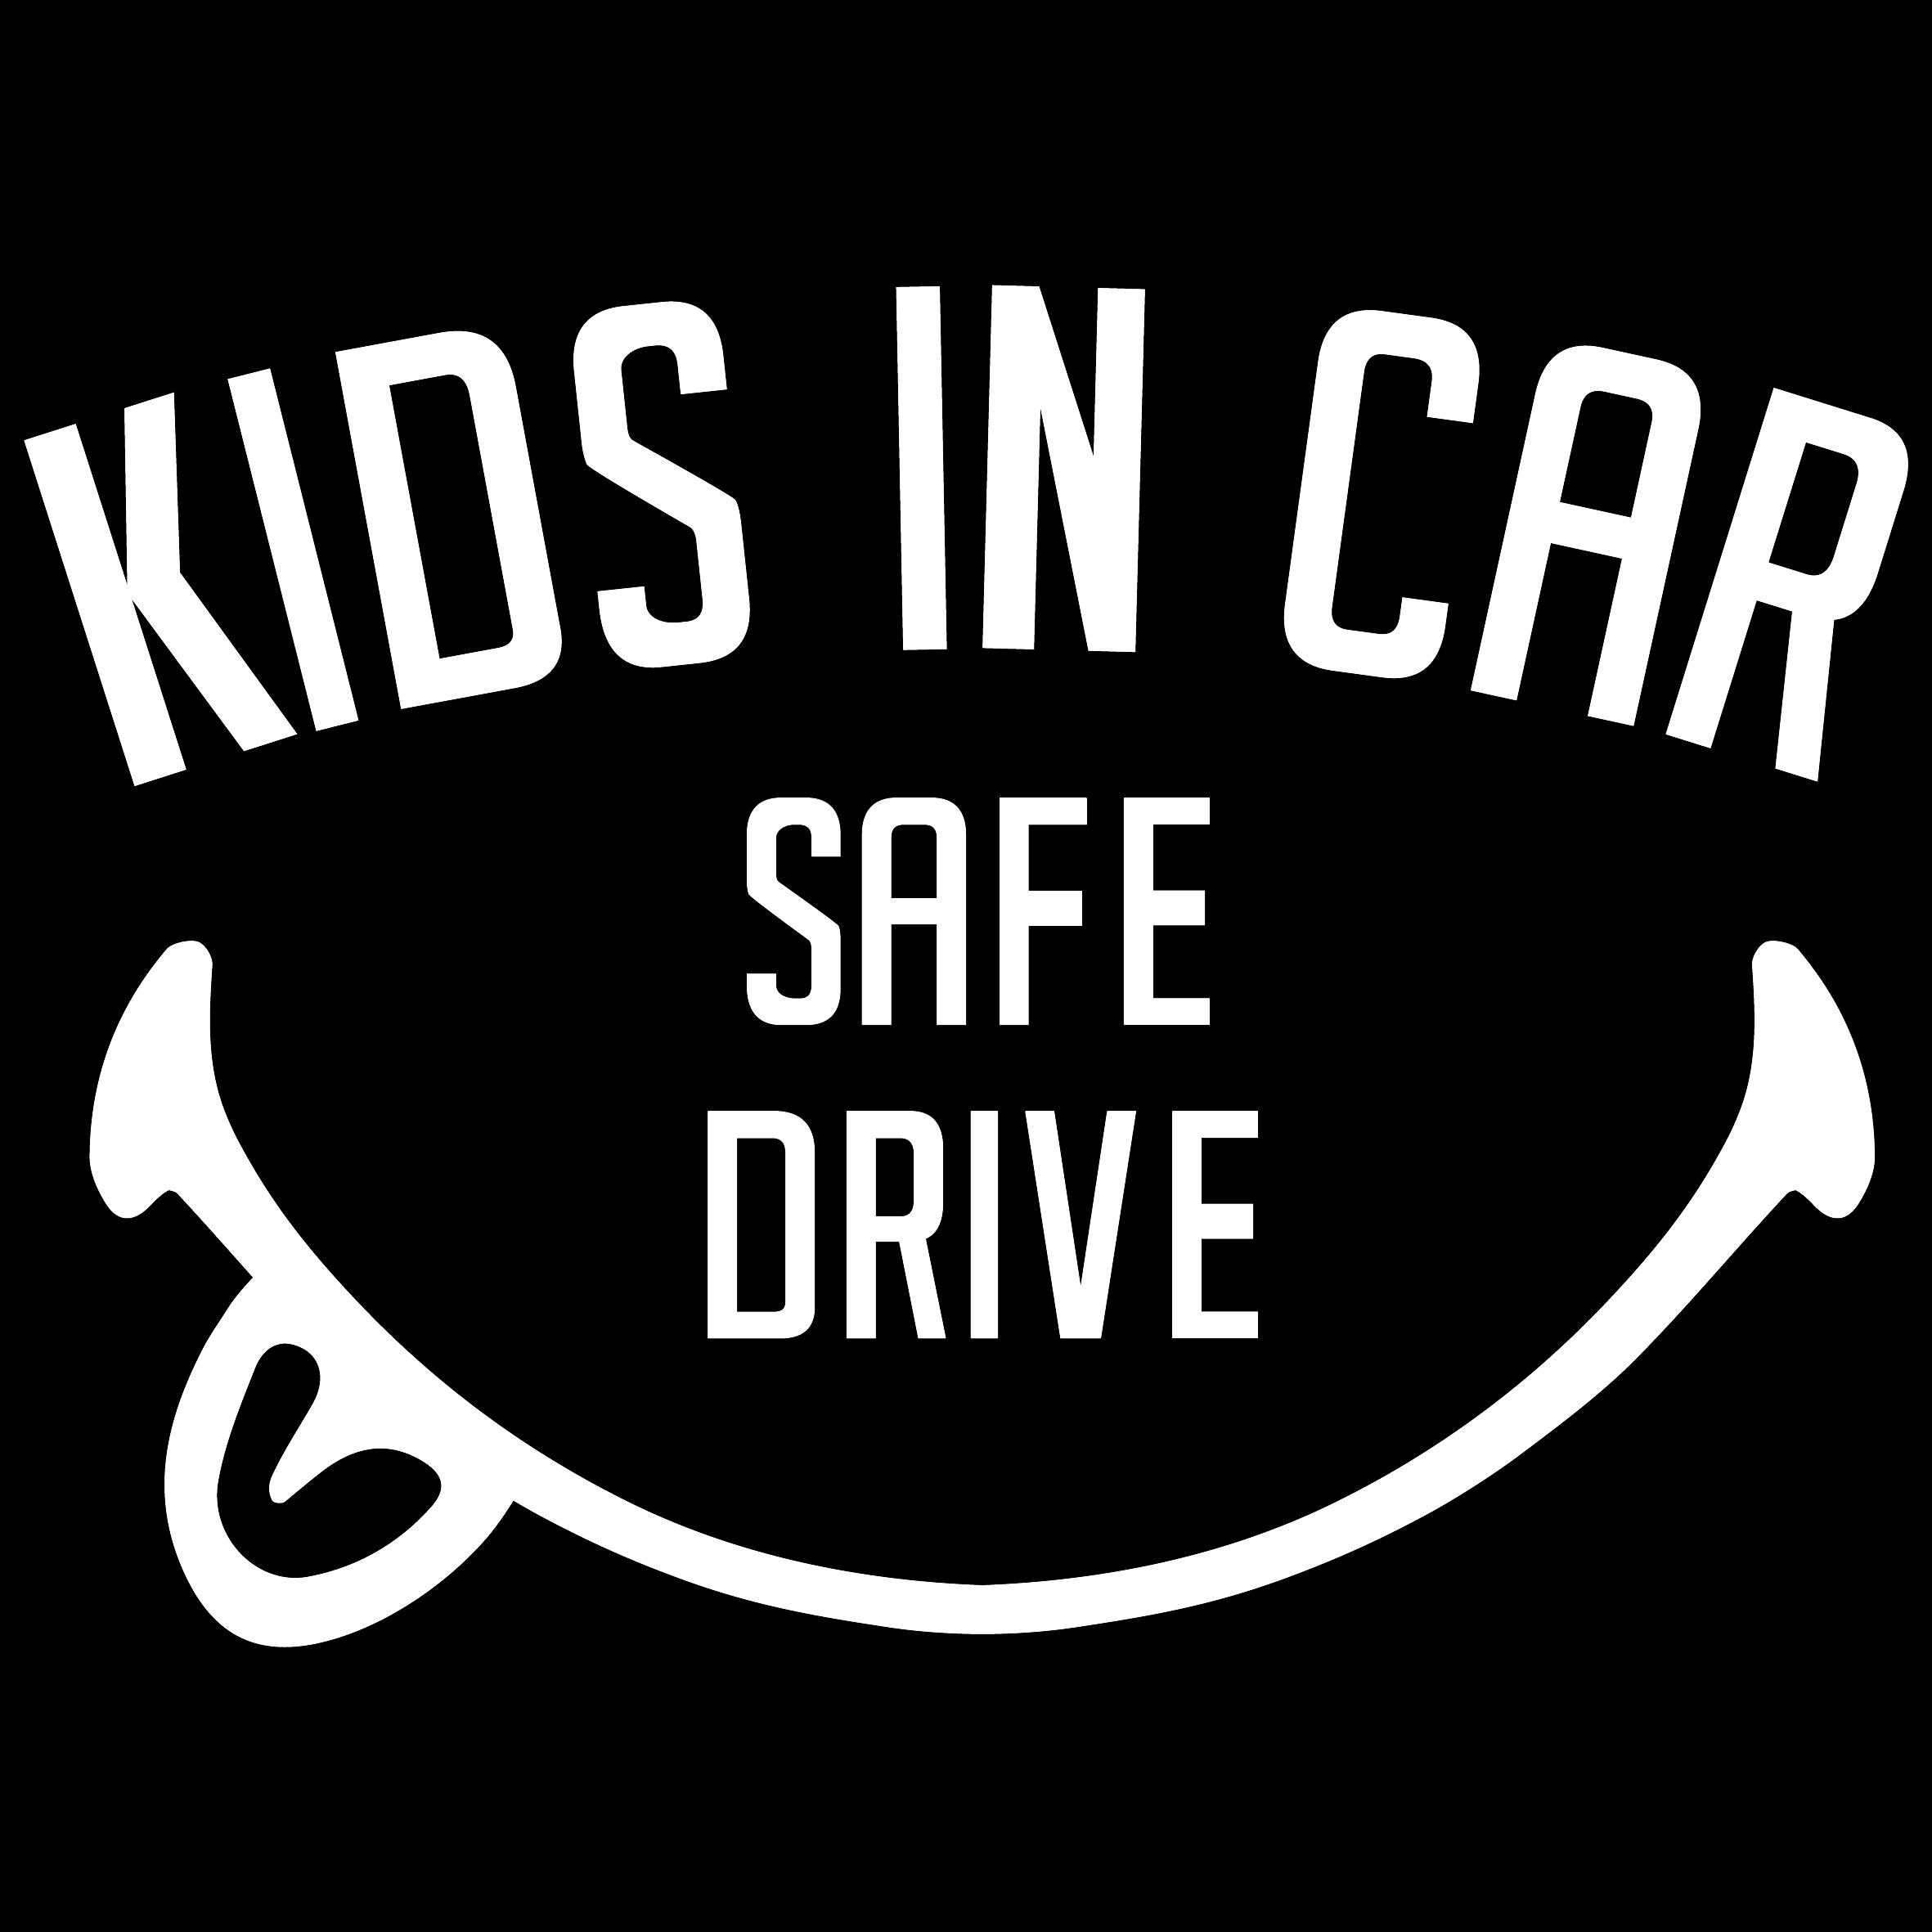 """KIDS IN CAR"" ステッカー"